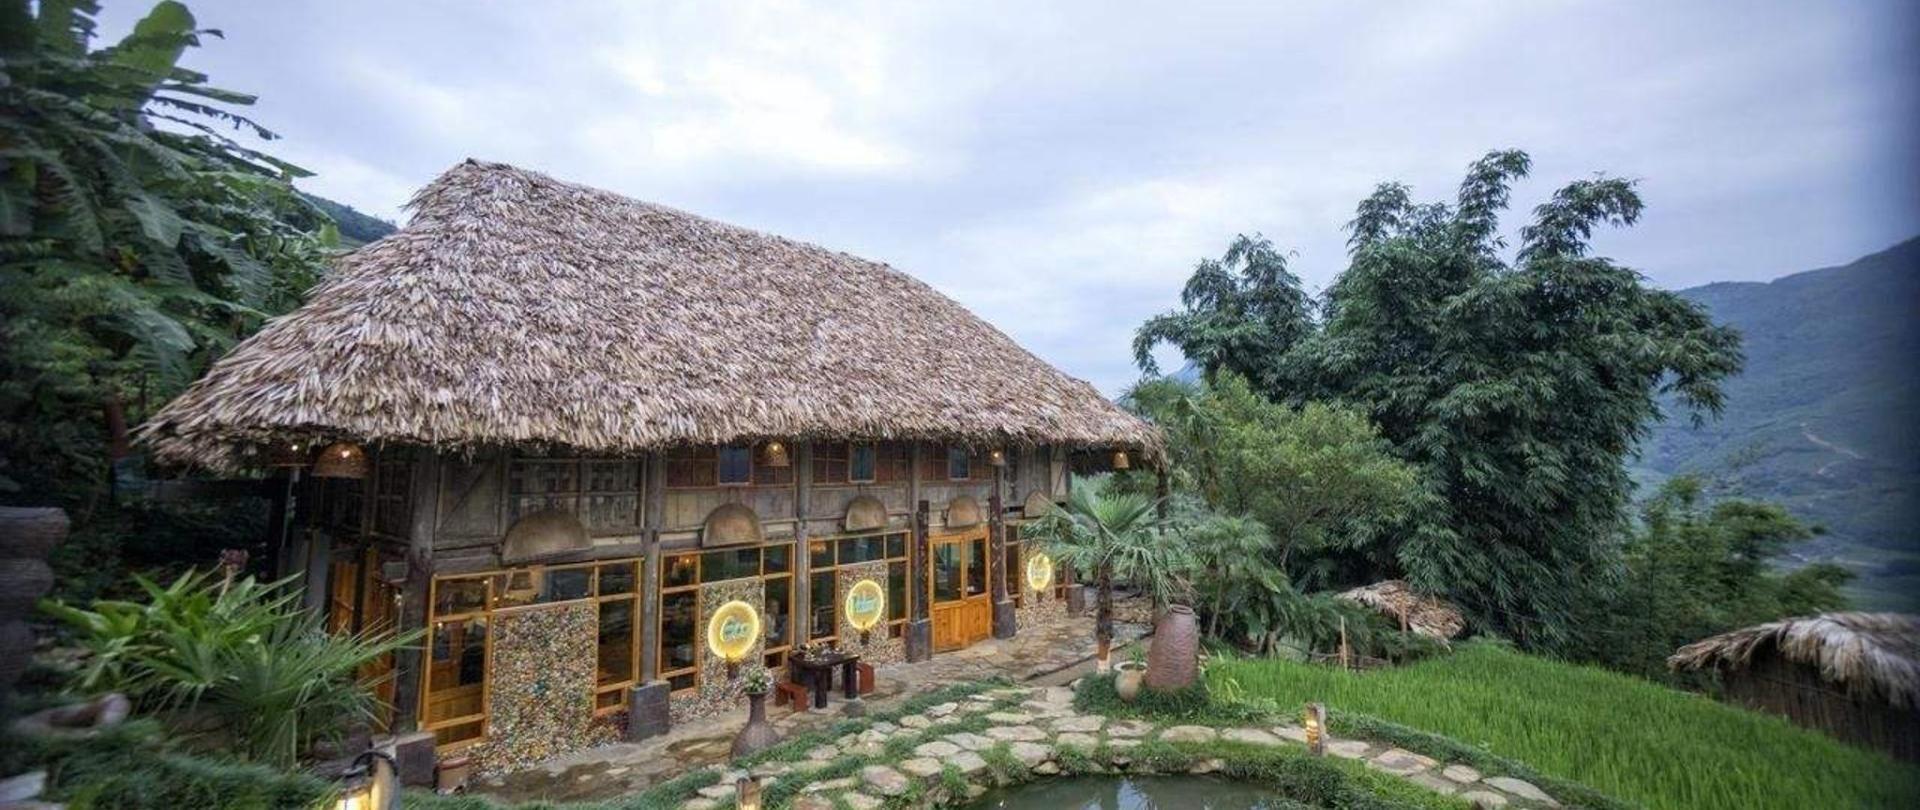 khuon vien eco palms house homestay sapa